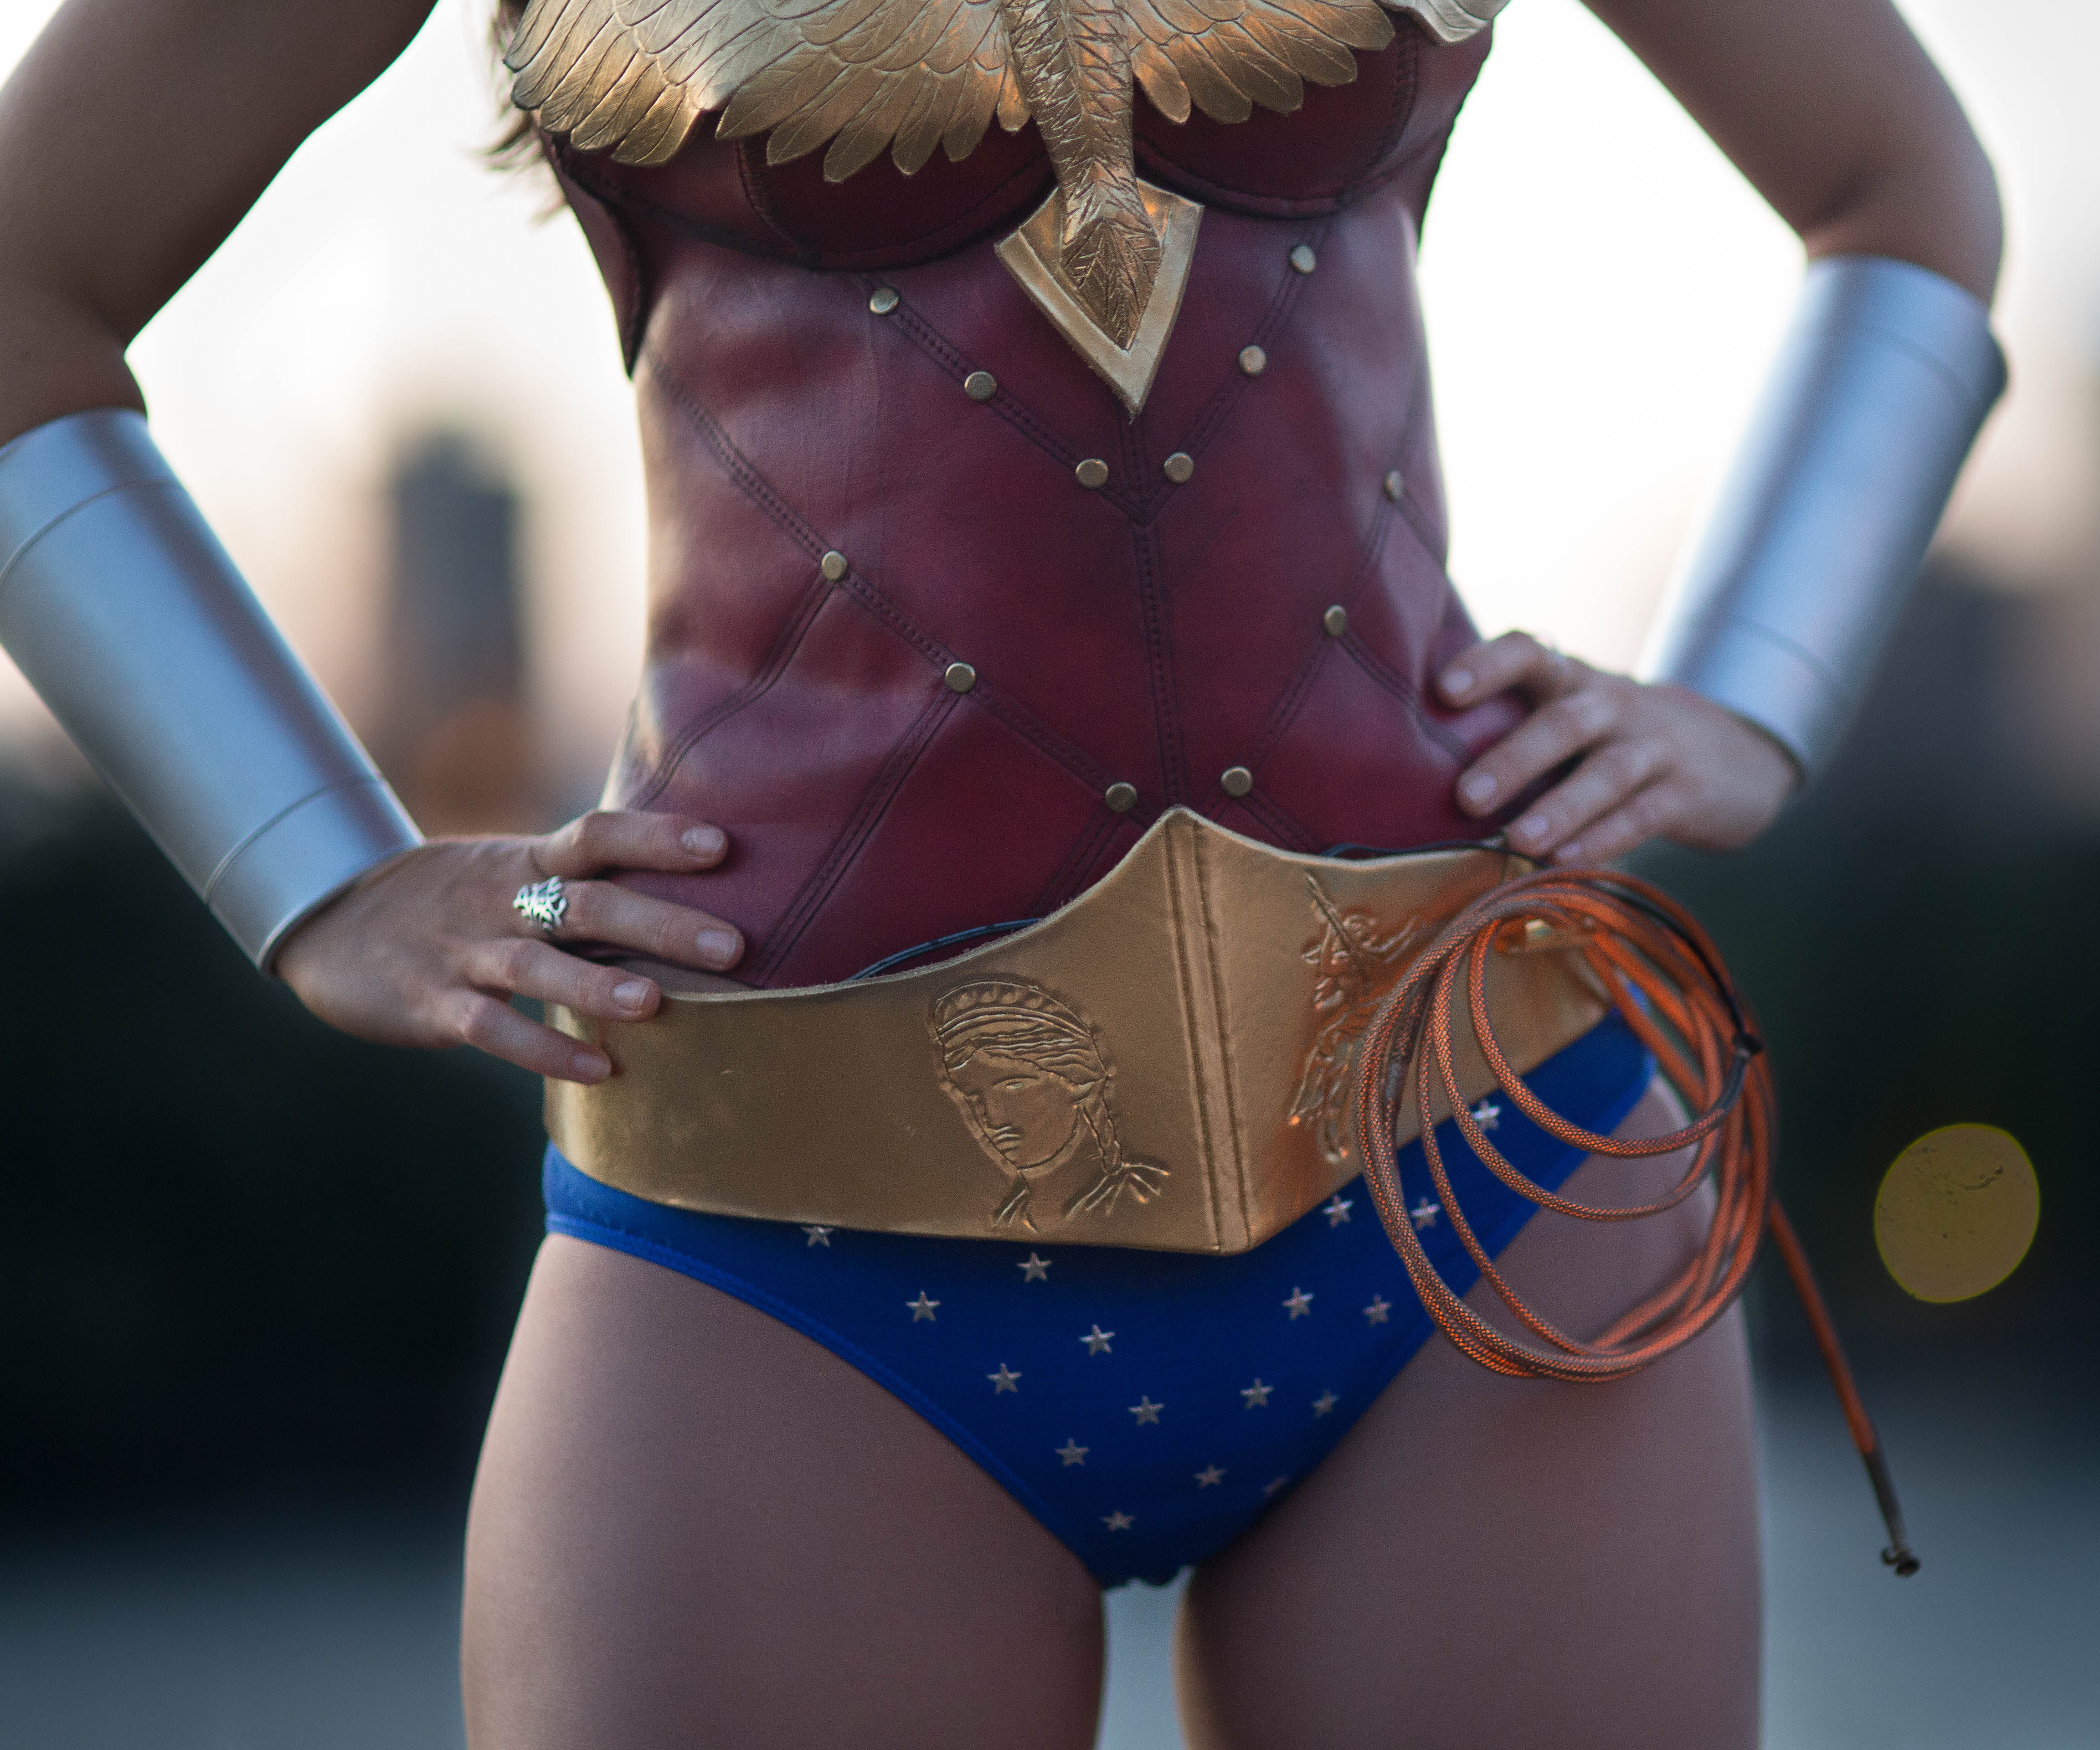 Detailed wonder woman costume